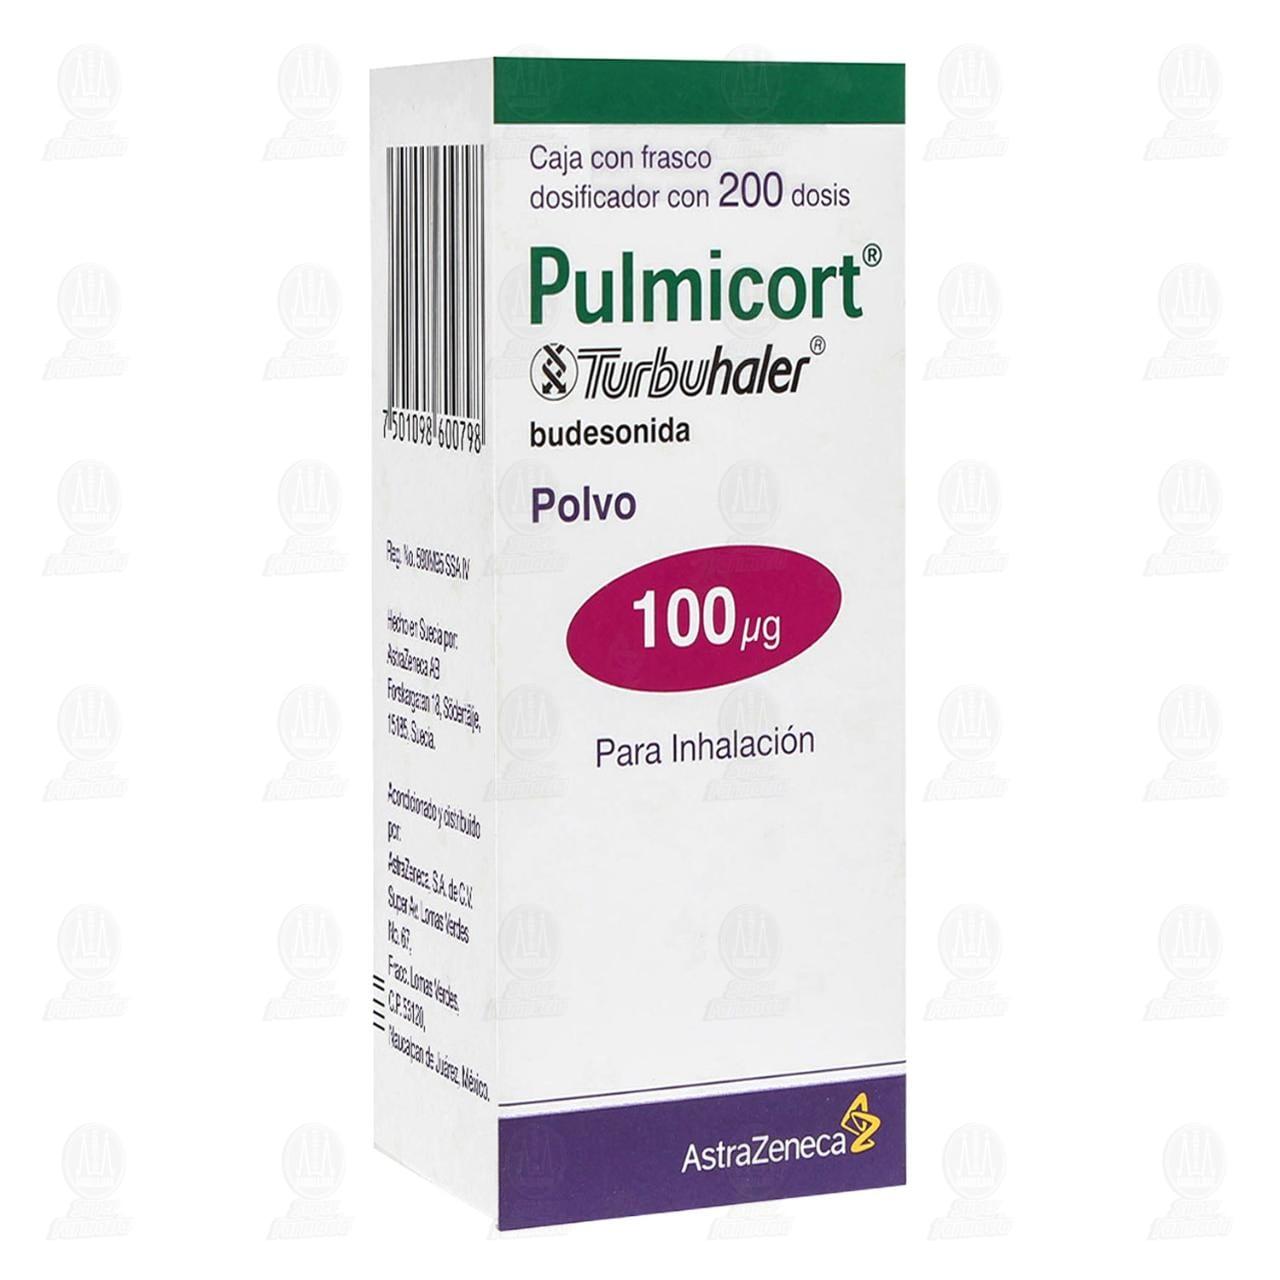 Comprar Pulmicort Turbuhaler 100mcg Polvo para Inhalación Frasco Dosificador 200 Dosis en Farmacias Guadalajara